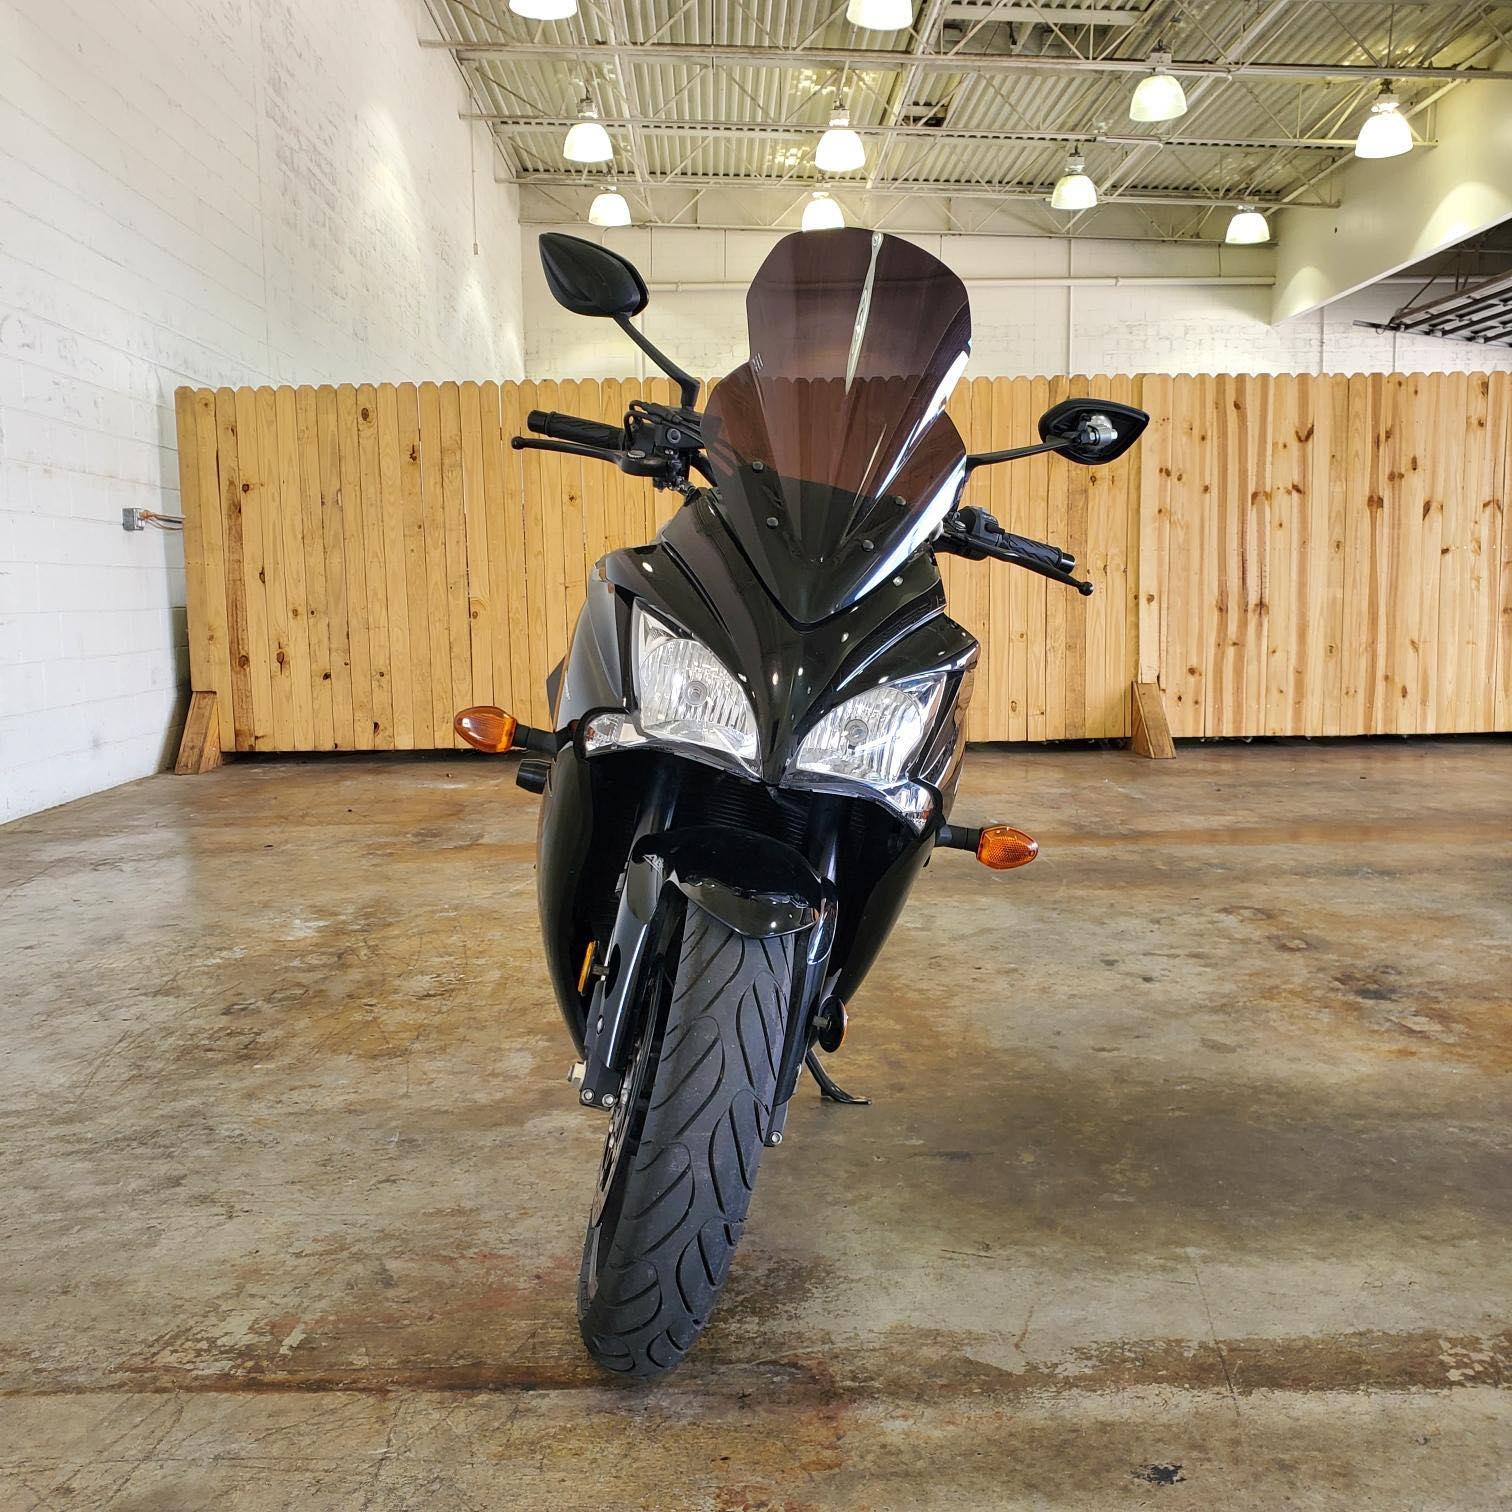 2020 Suzuki GSX-S 1000F at Twisted Cycles